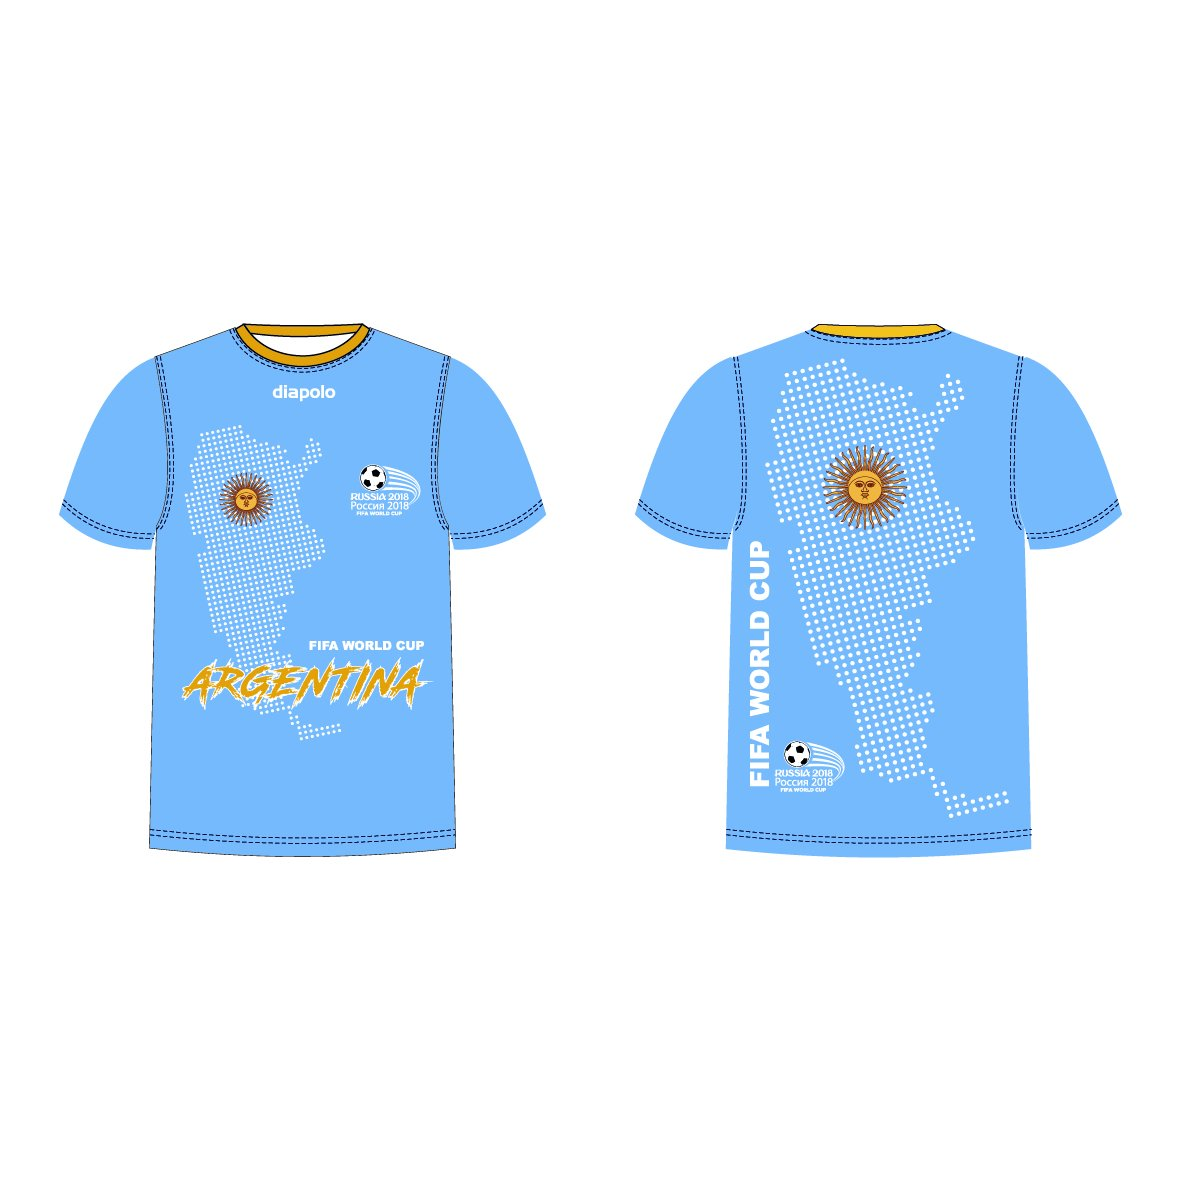 Diapolo Professional Atmungsaktiv Qualitativ Hochfertiger Funktion Fan T-Shirt Argentina S M L XL XXL